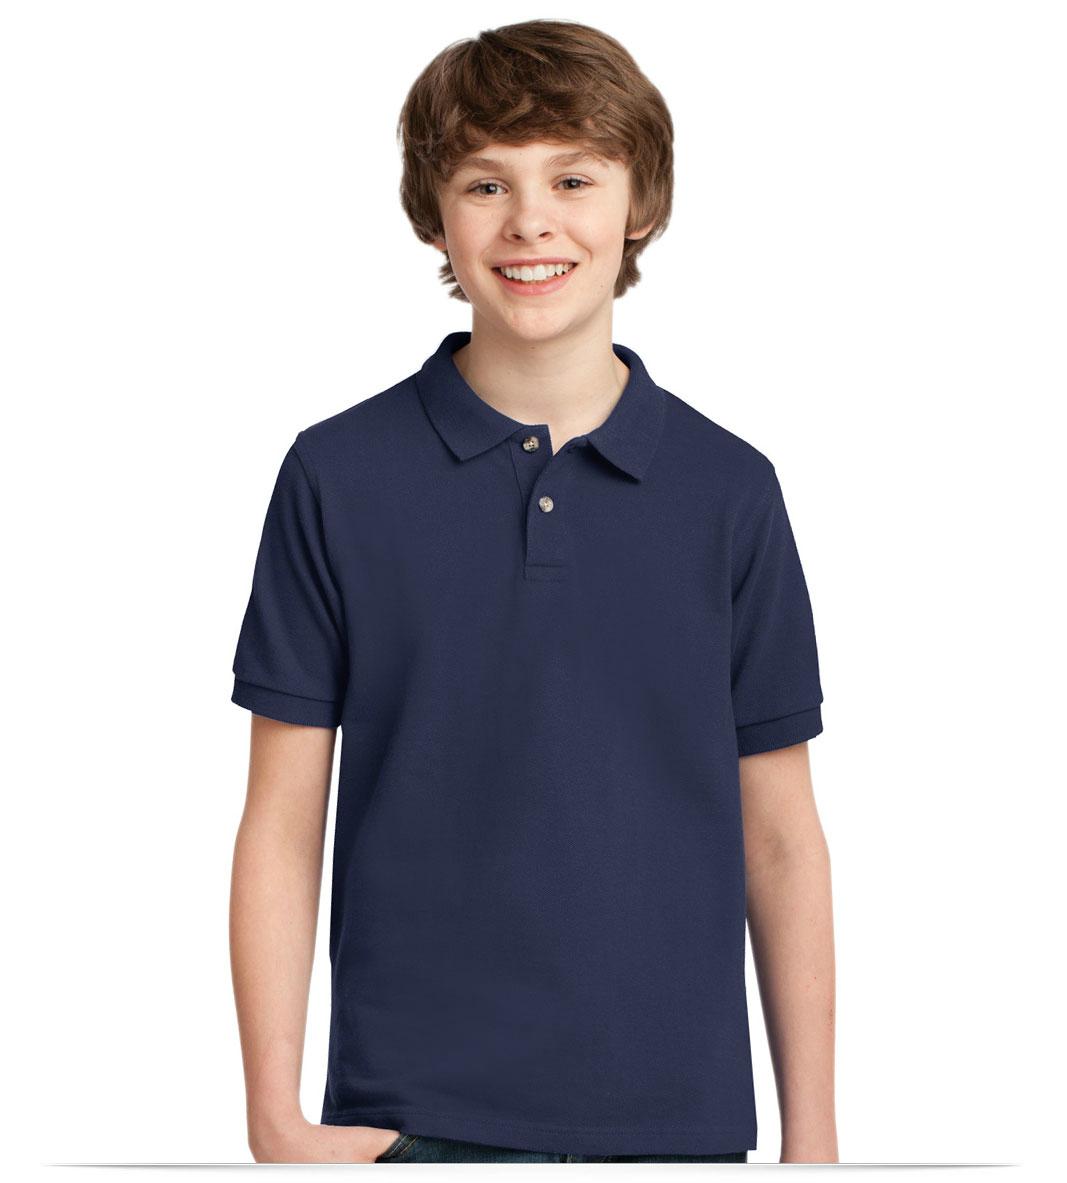 Design Embroidered Allstar Logo Custom Logo School Polo Shirt Online